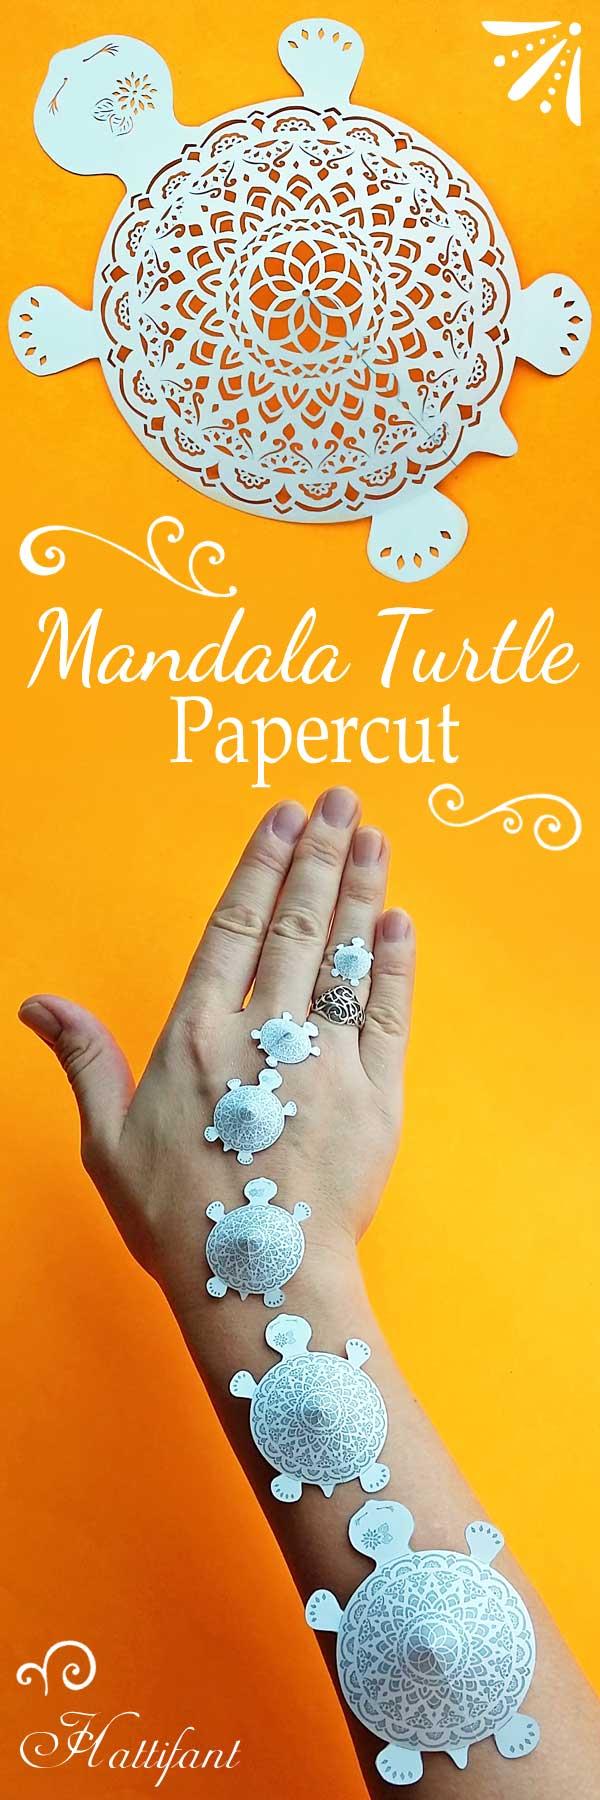 Hattifant's Mandala Turtle to papercut a papercraft paperart printable to DIY